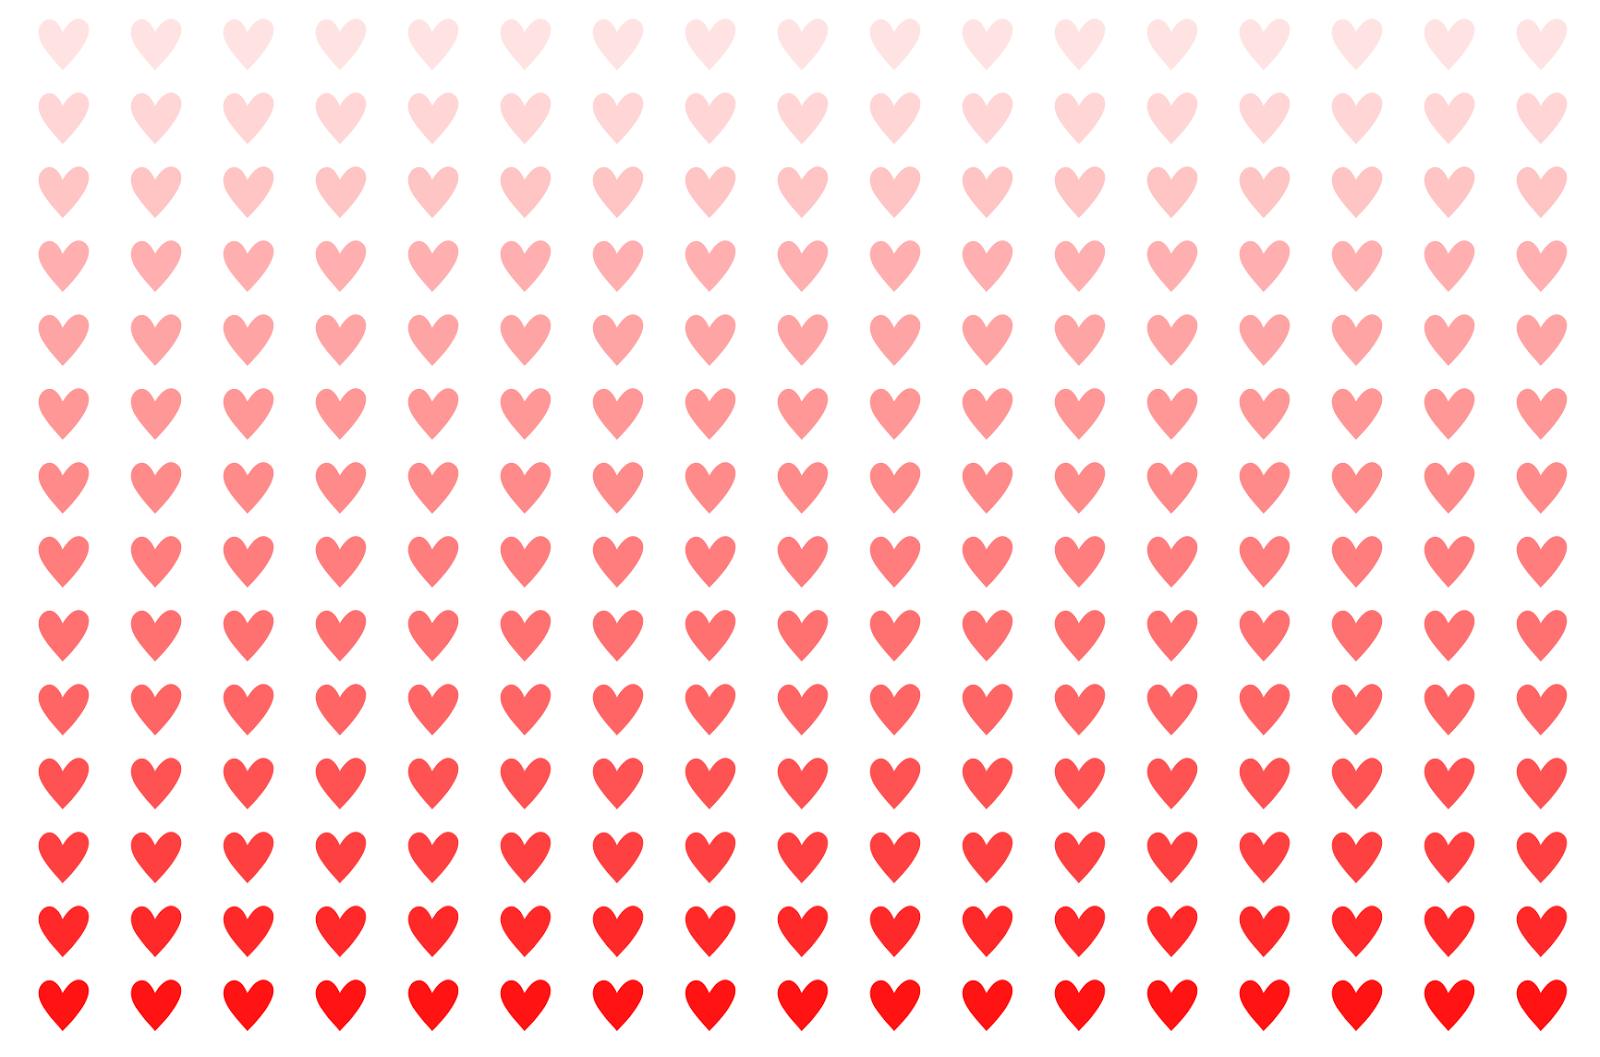 February Wallpaper 1600x1057